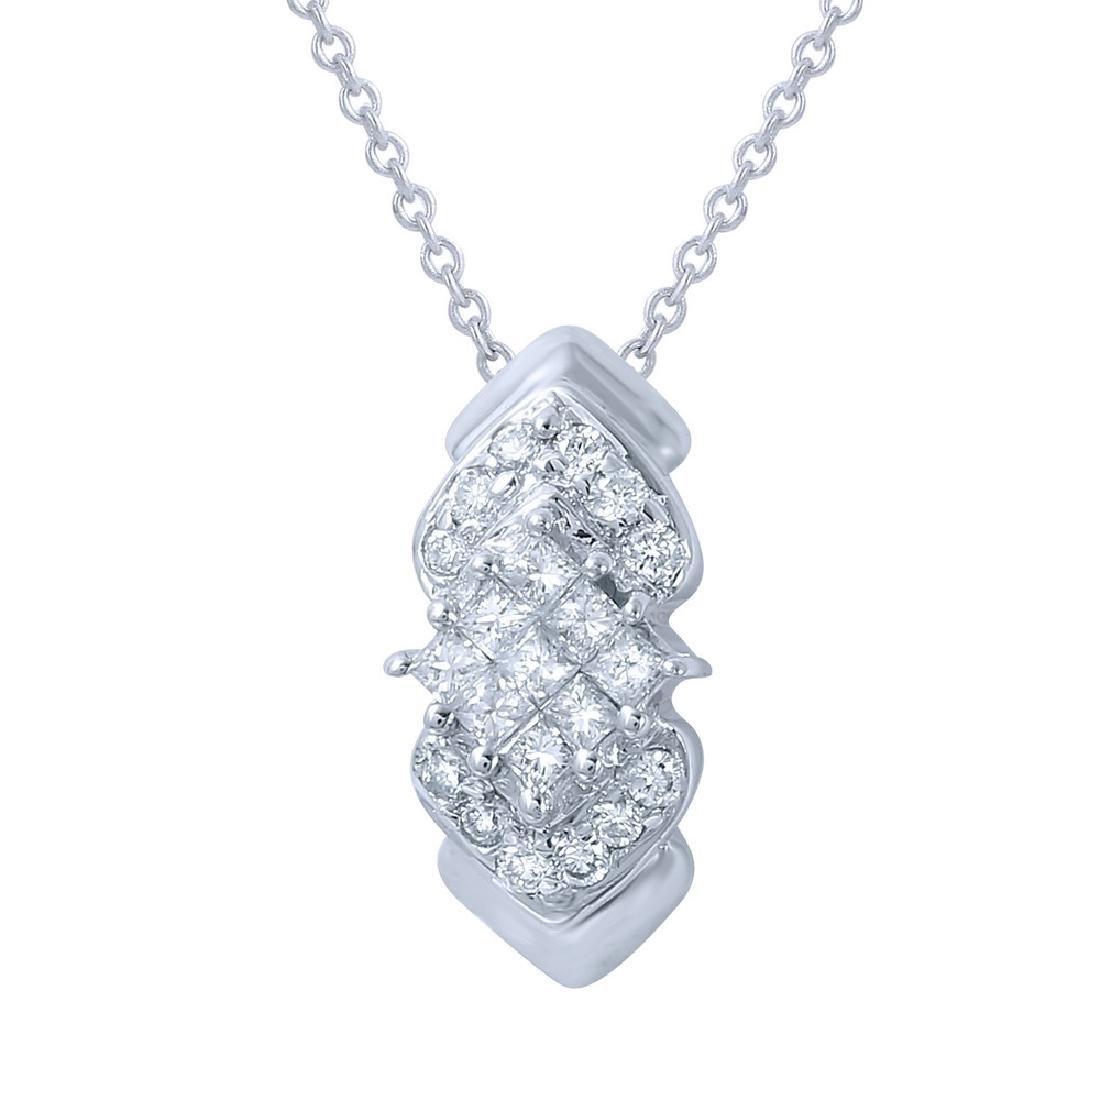 Genuine 0.58 TCW 14K White Gold Ladies Necklace